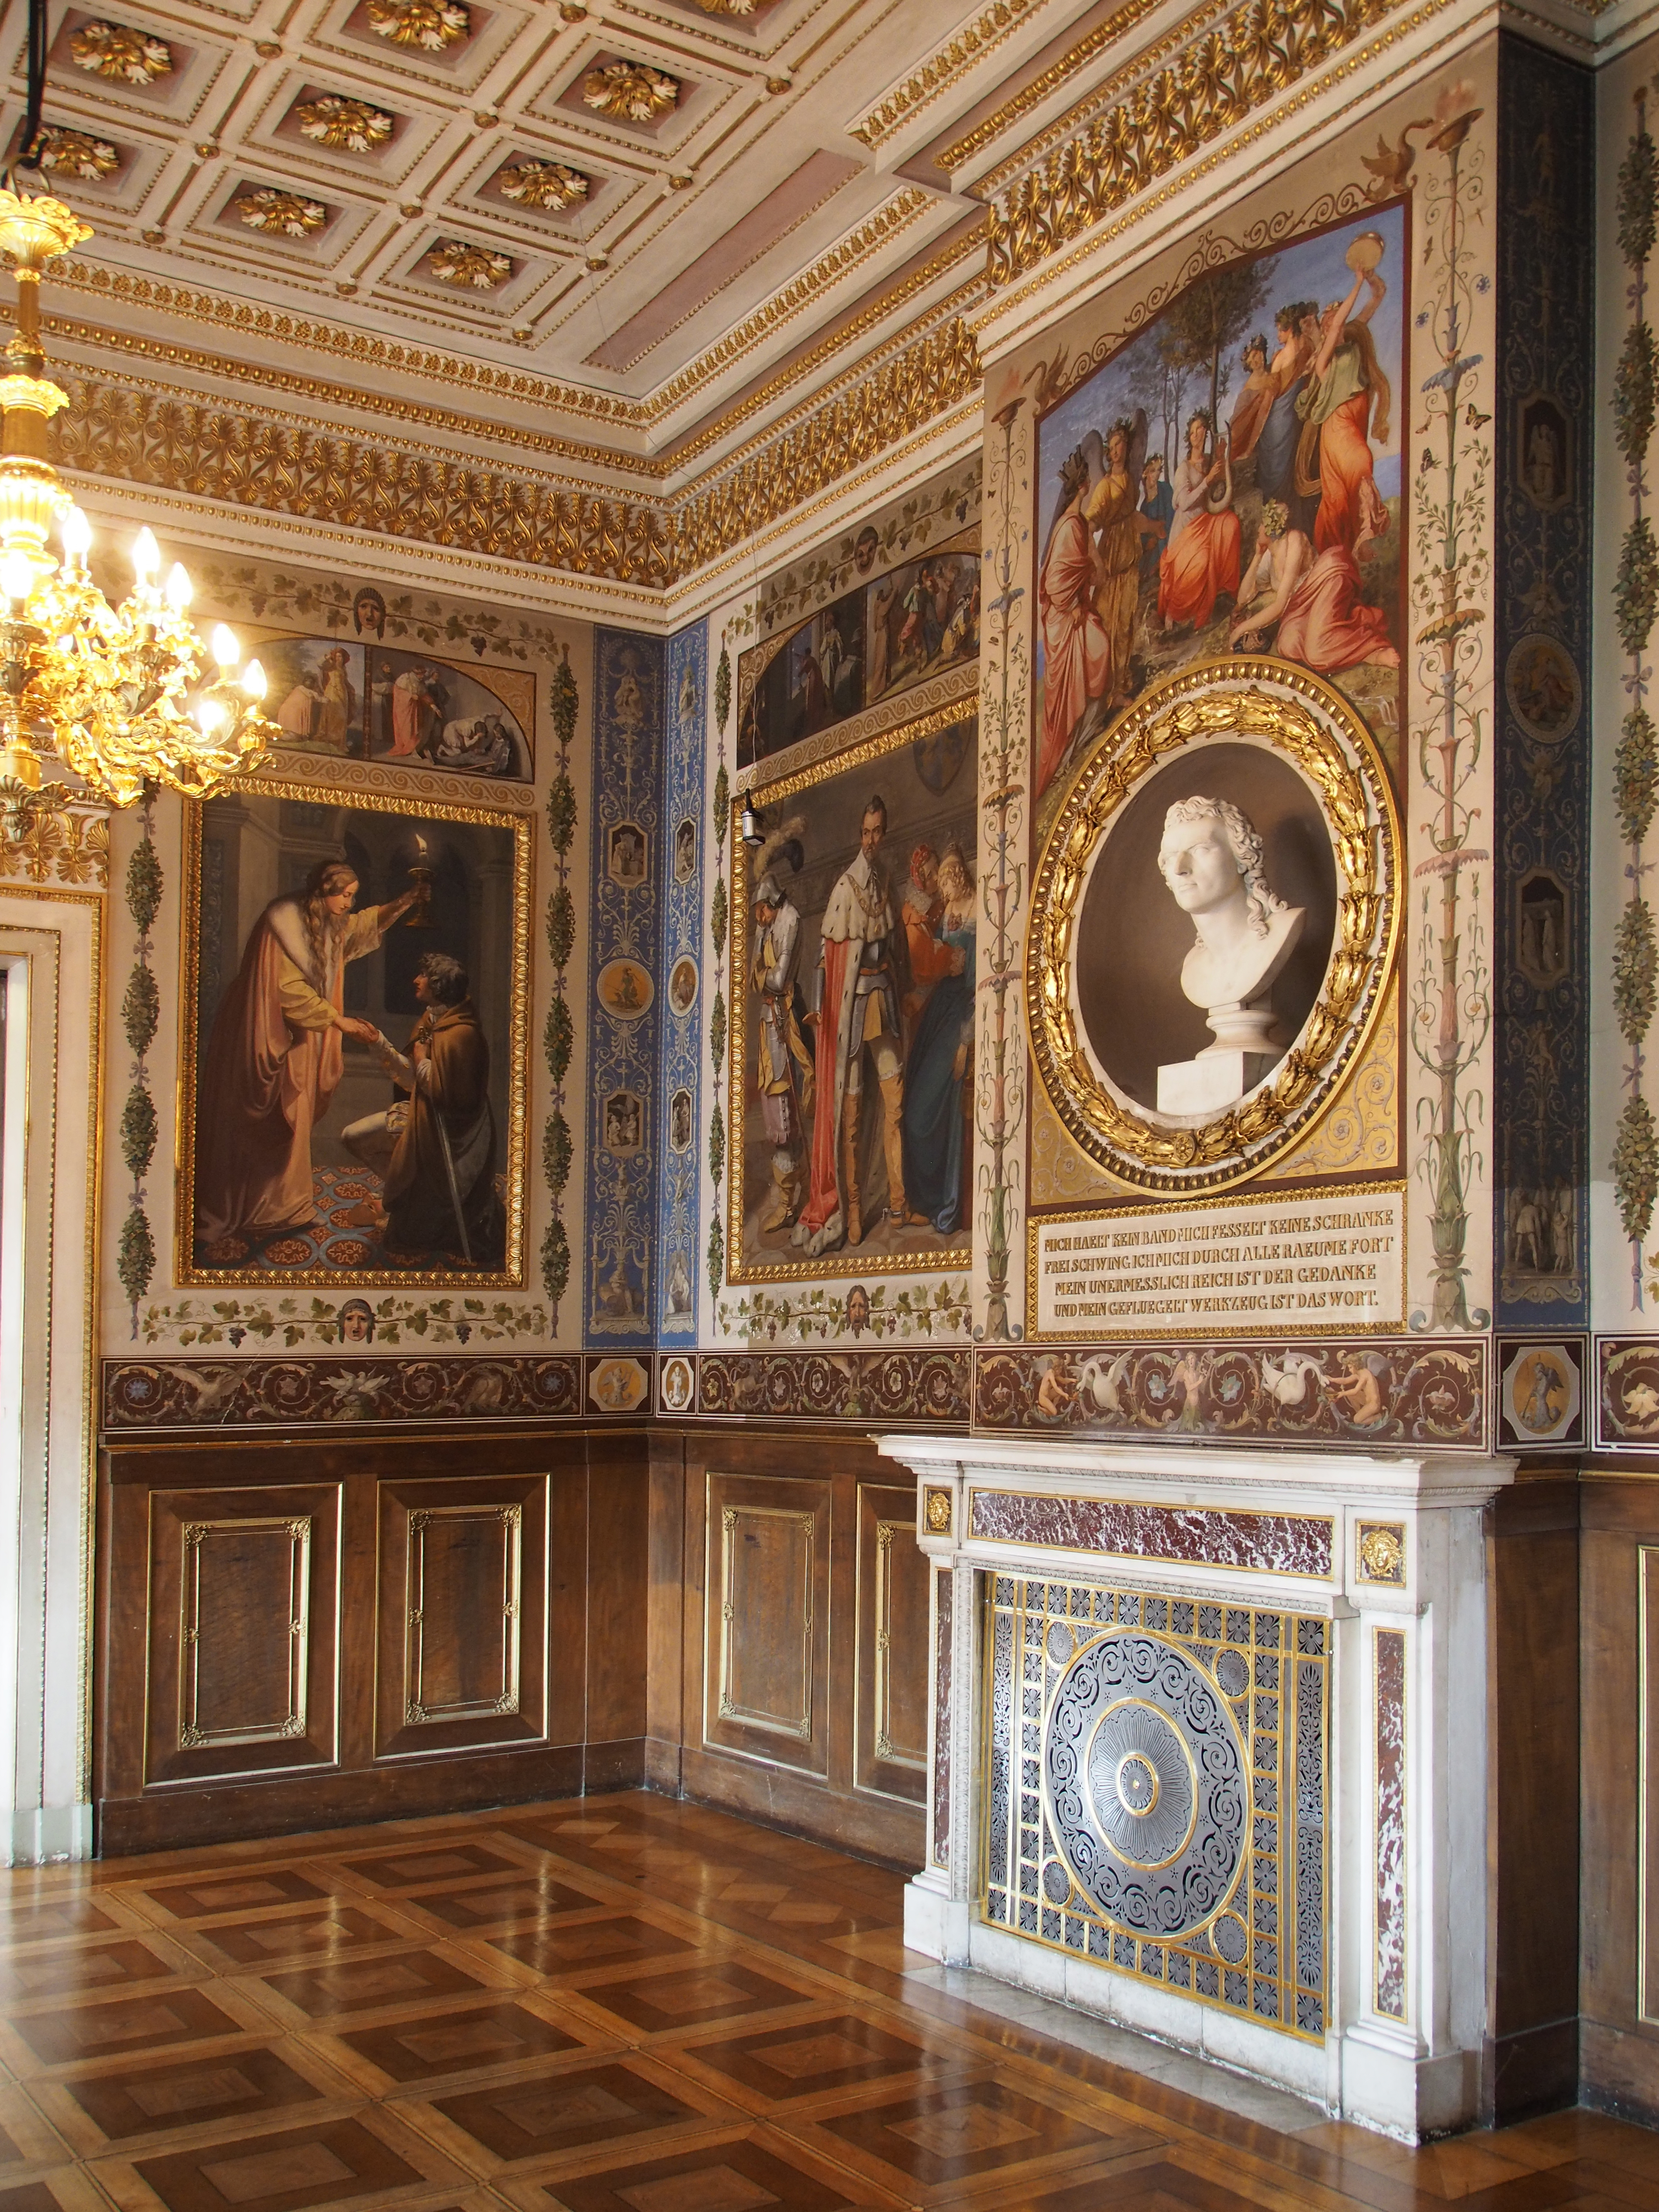 File:Schillerzimmer@Weimar Stadtschloss Innen.JPG - Wikimedia Commons